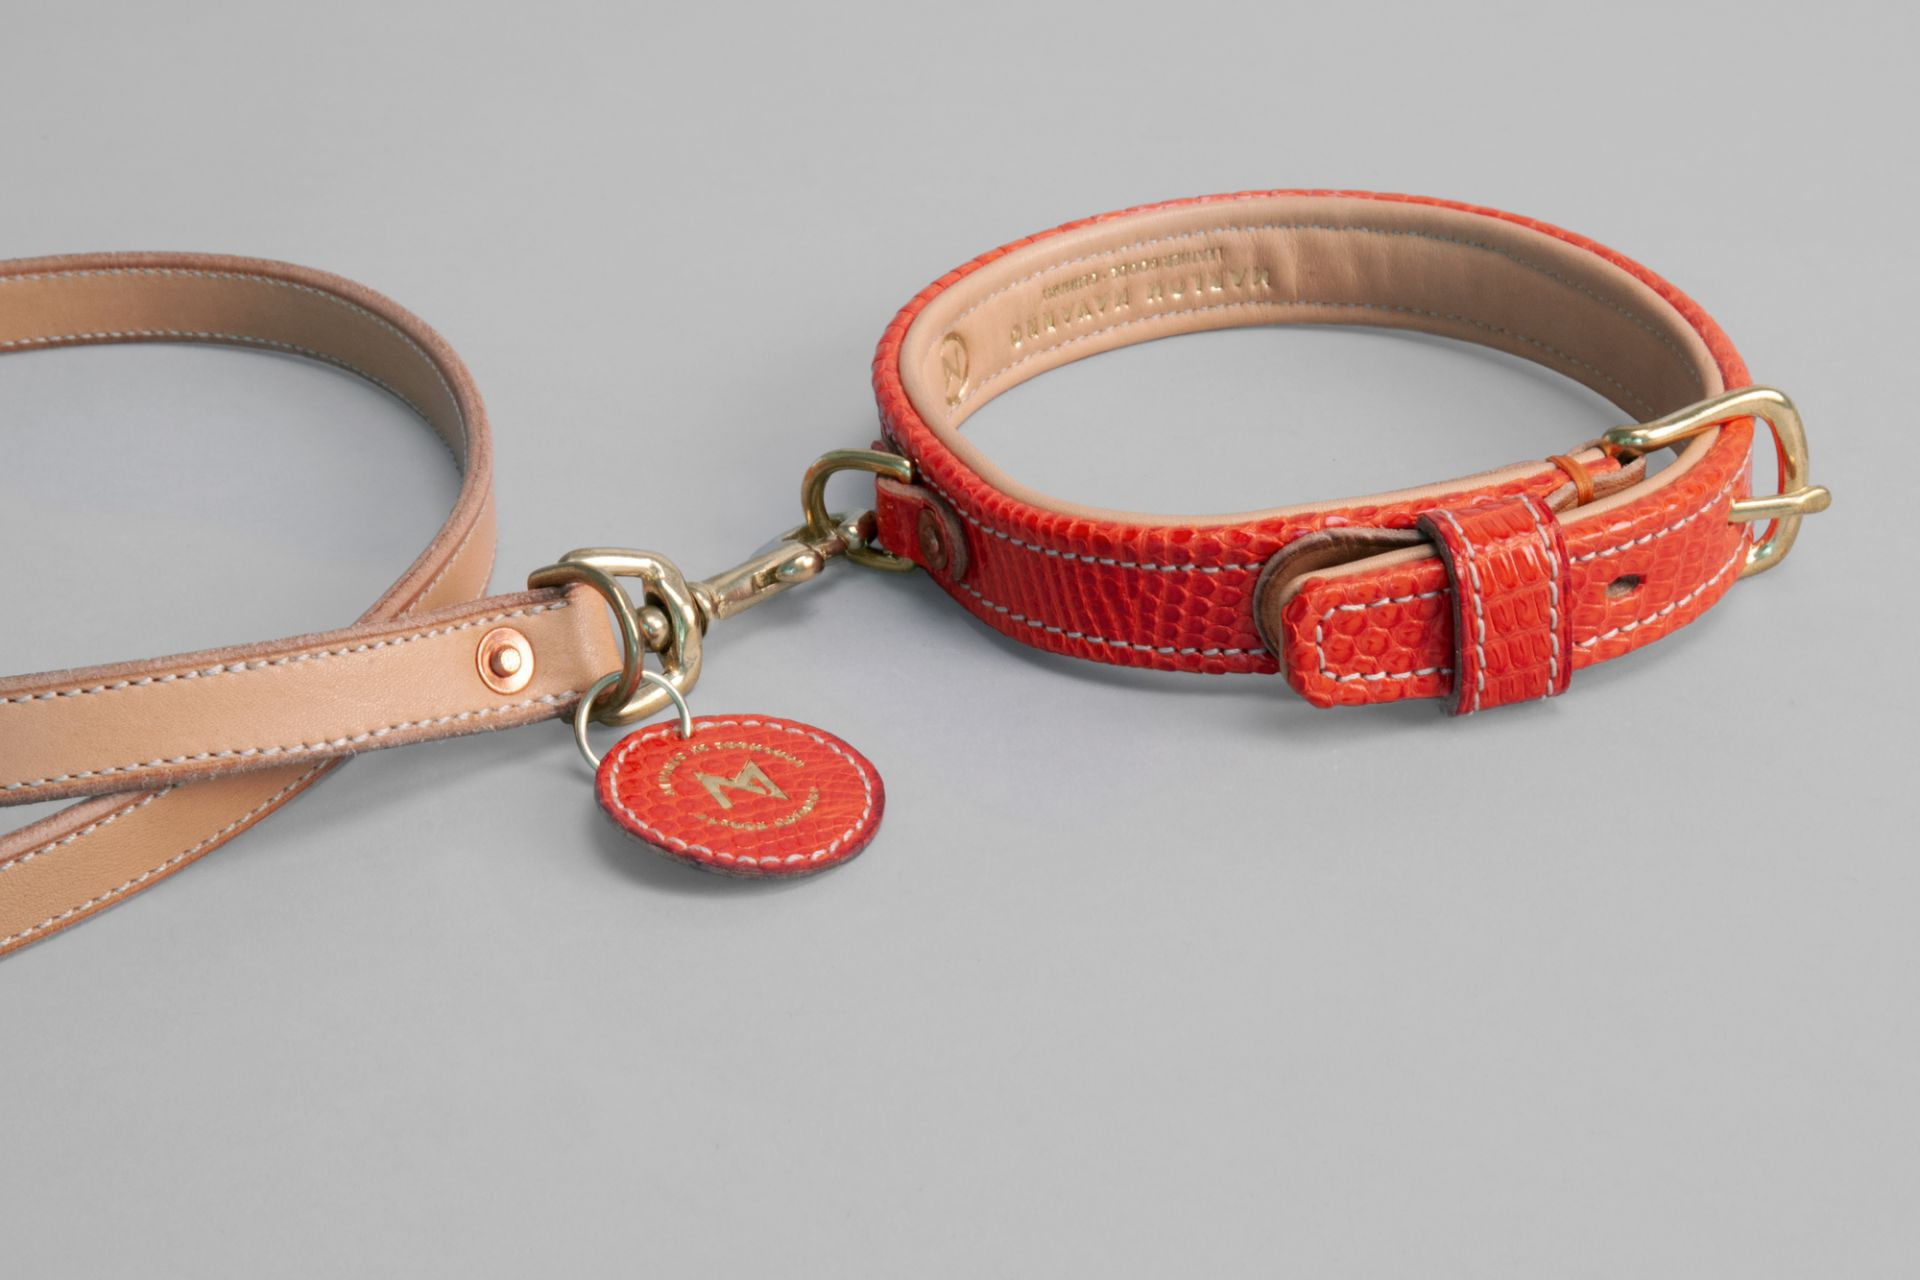 Hundehalsband und Leine, MARLON NAVARRO Leather Goods, Offenbach am Main, 2020 © DLM, A. Džaferagić